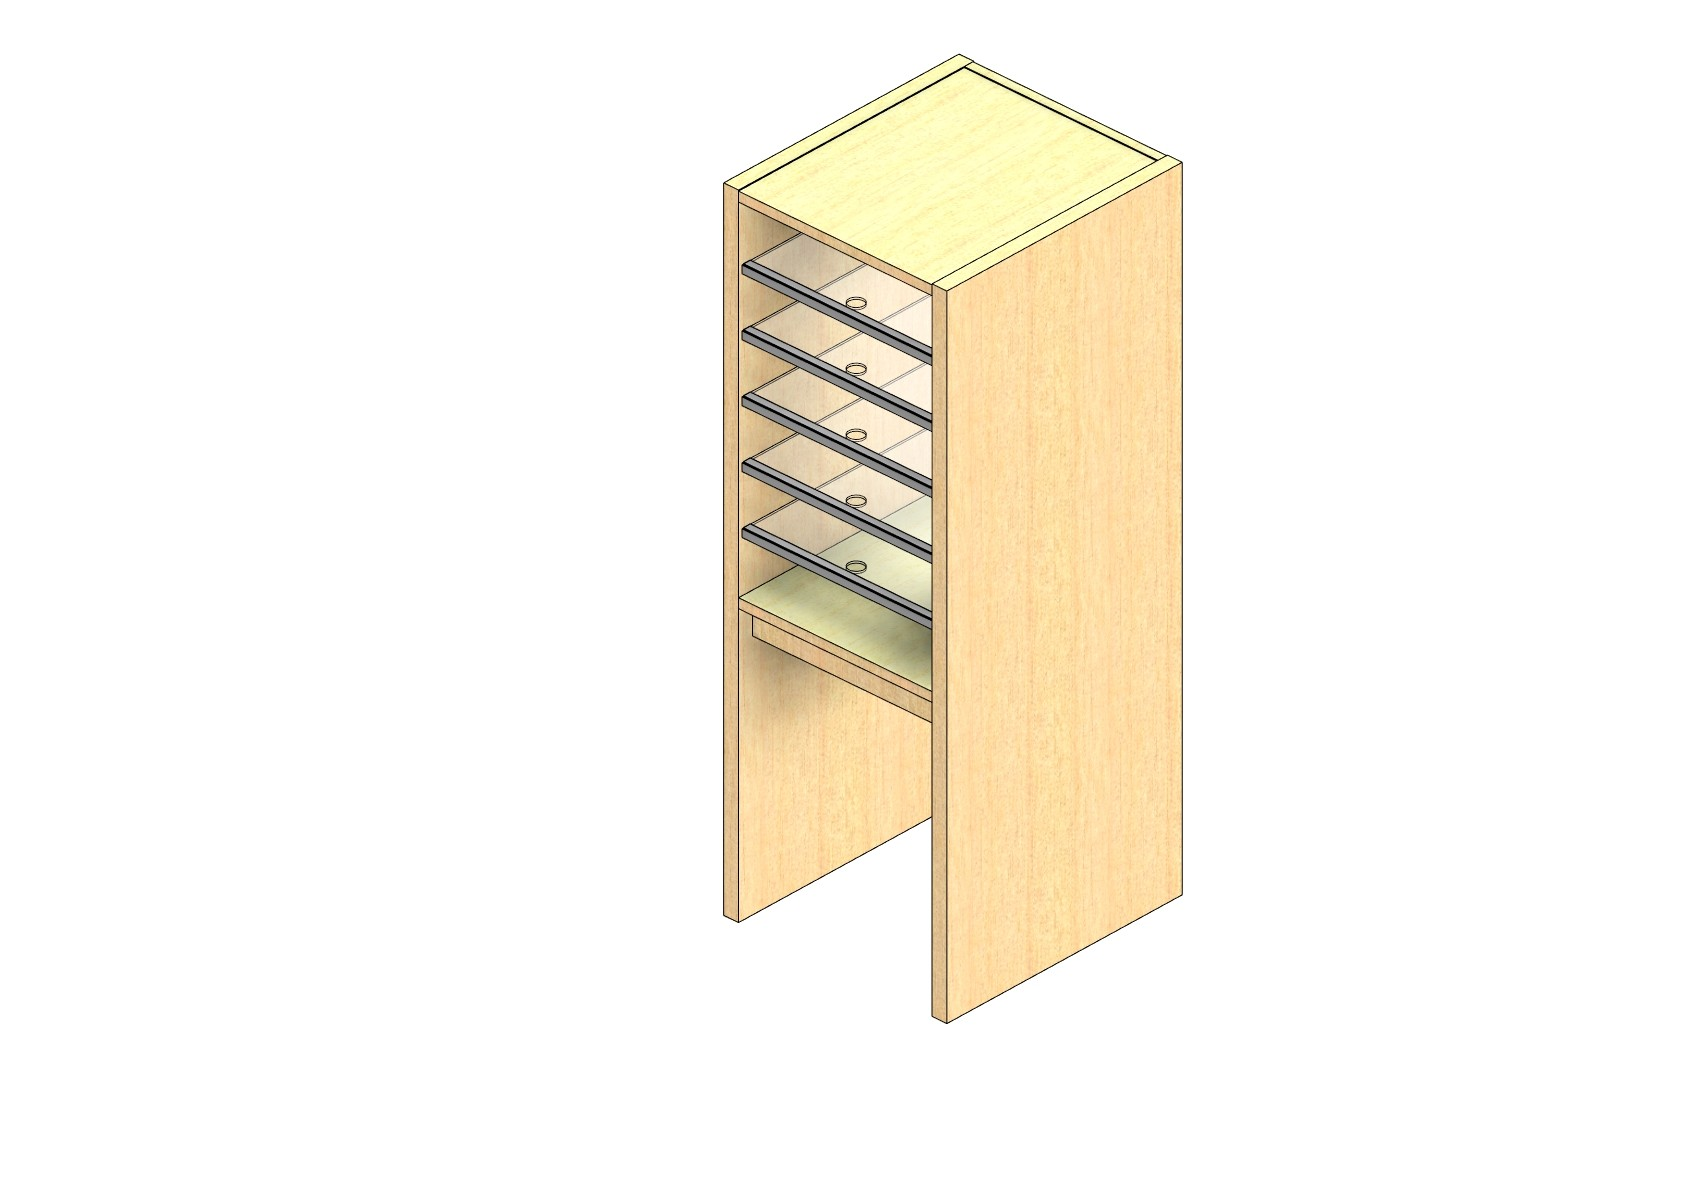 "Oversize Sized Plexi Back Sort Module - 1 Column - 24"" Sorting Height w/ 18"" Riser"